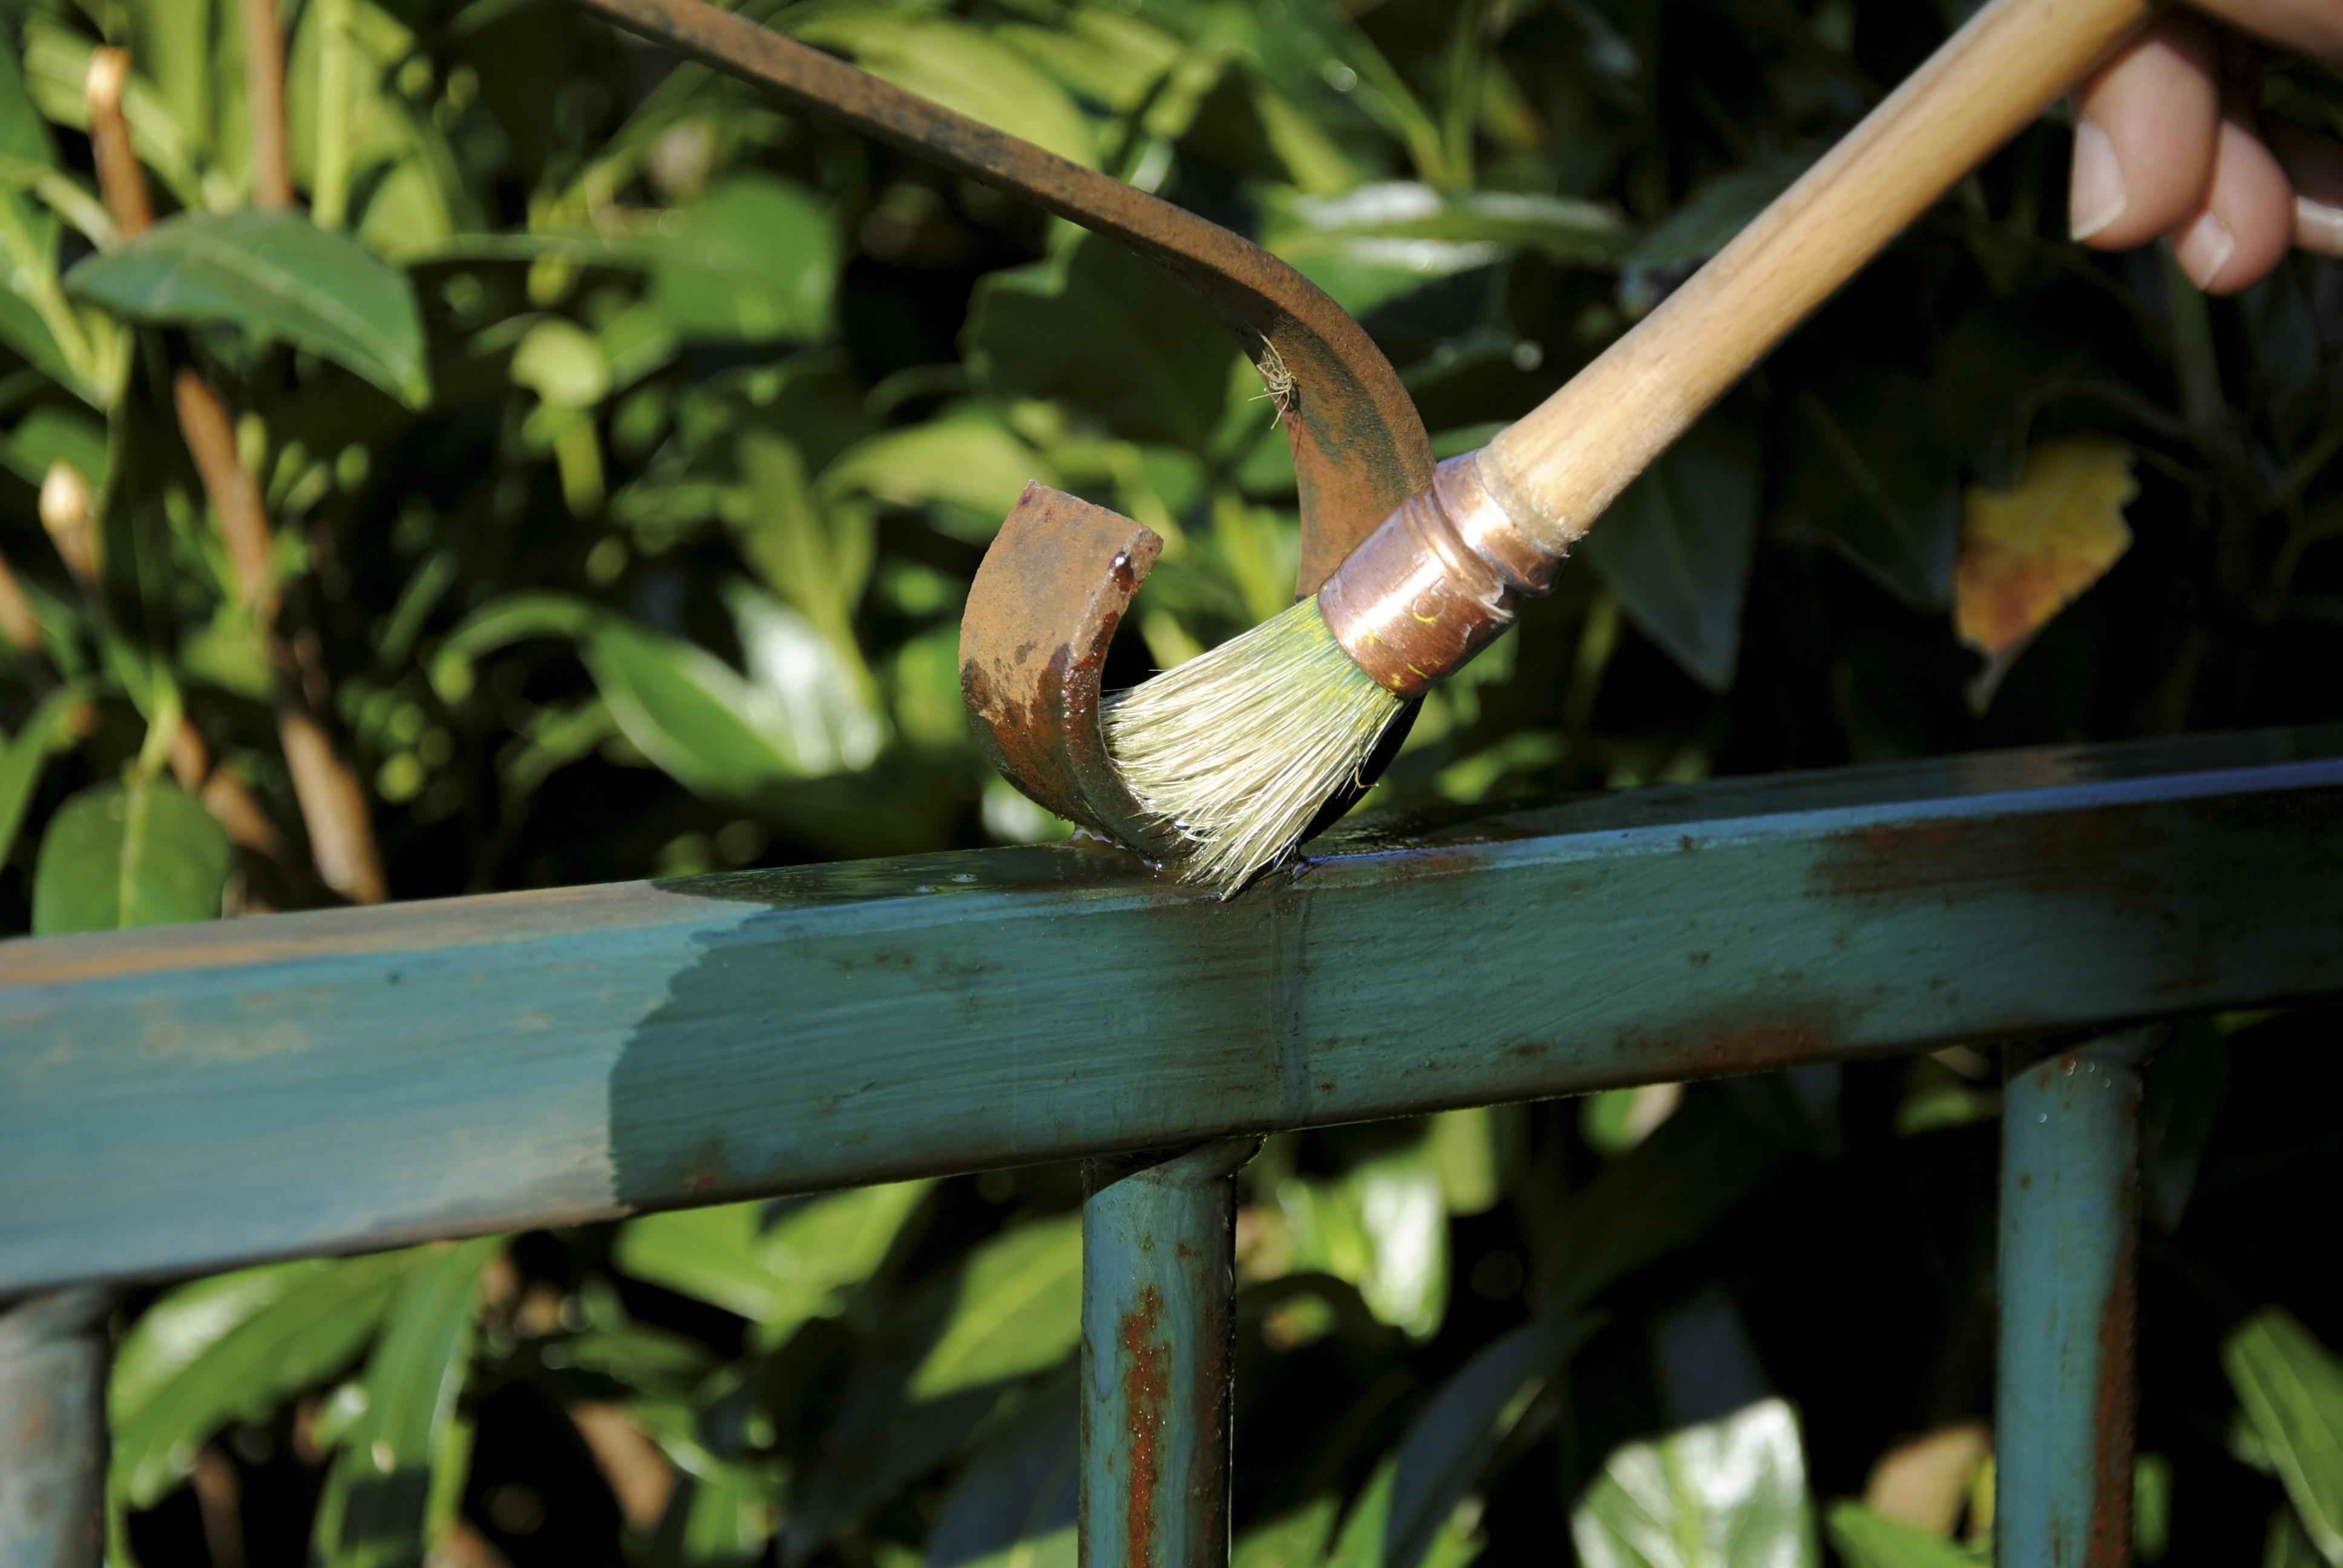 Owatrol Oil used on metal fence - ©Adfields